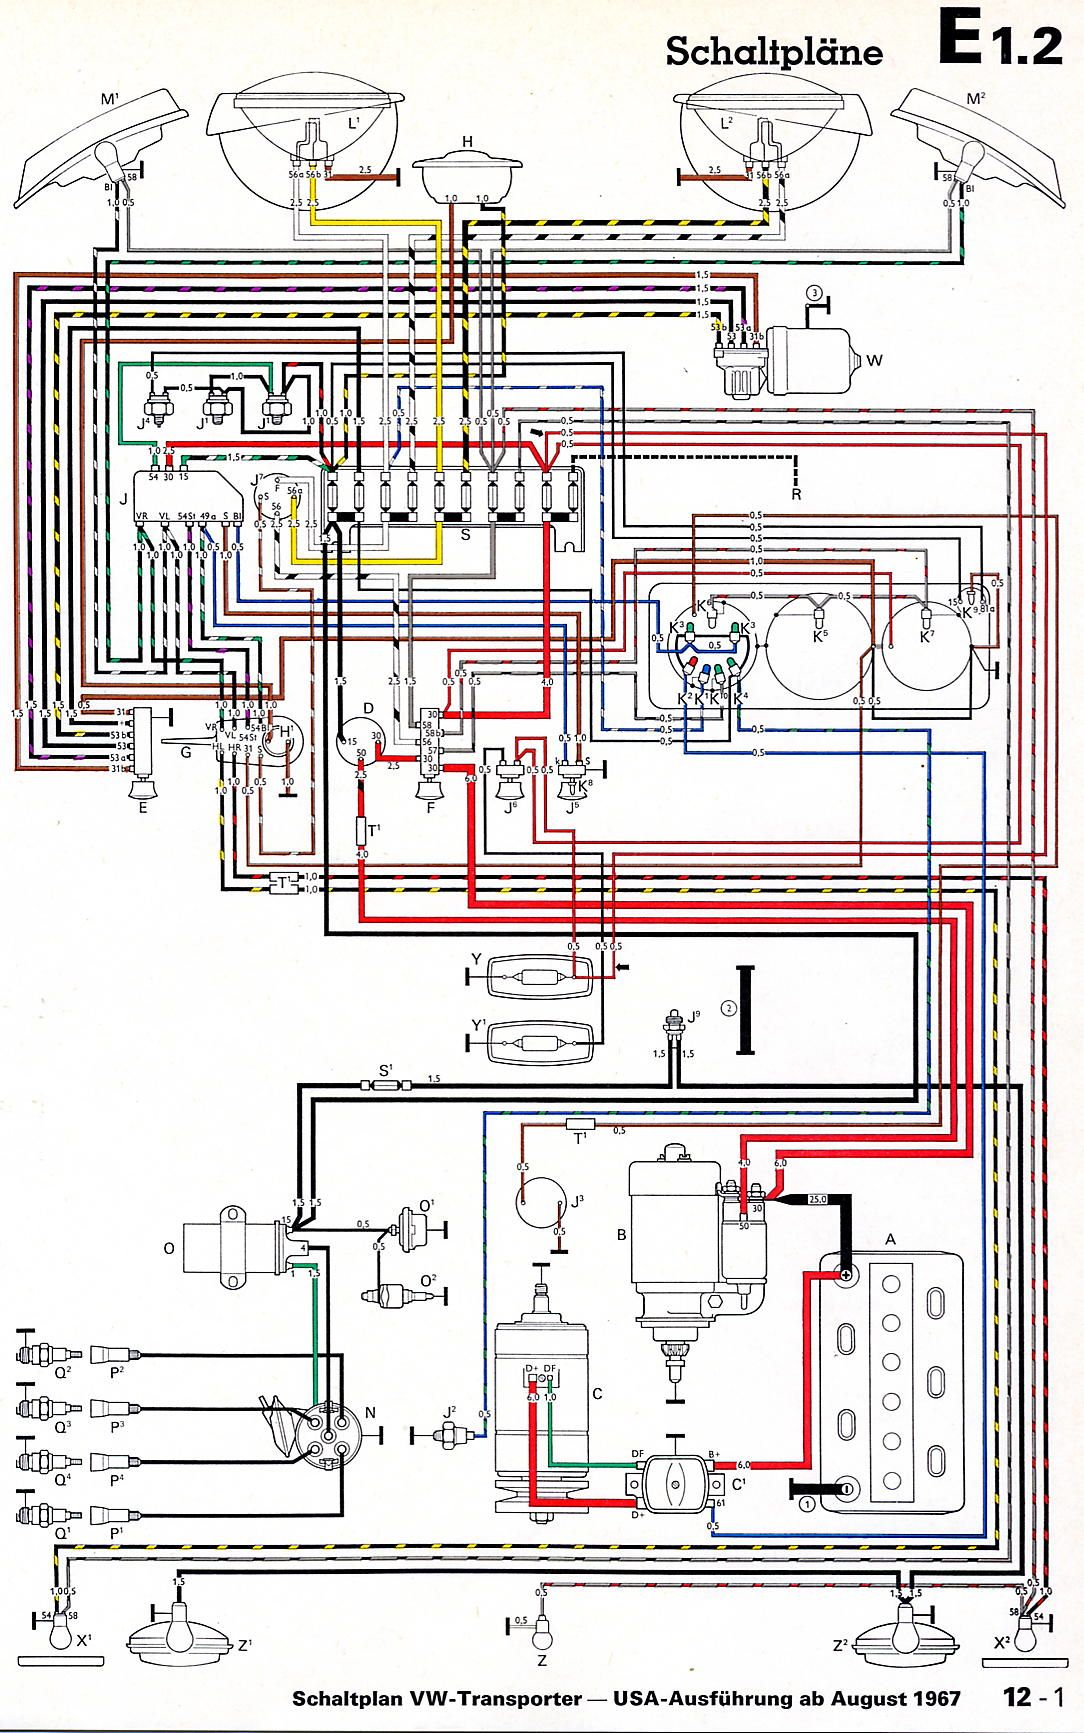 1971 vw bug ignition wiring